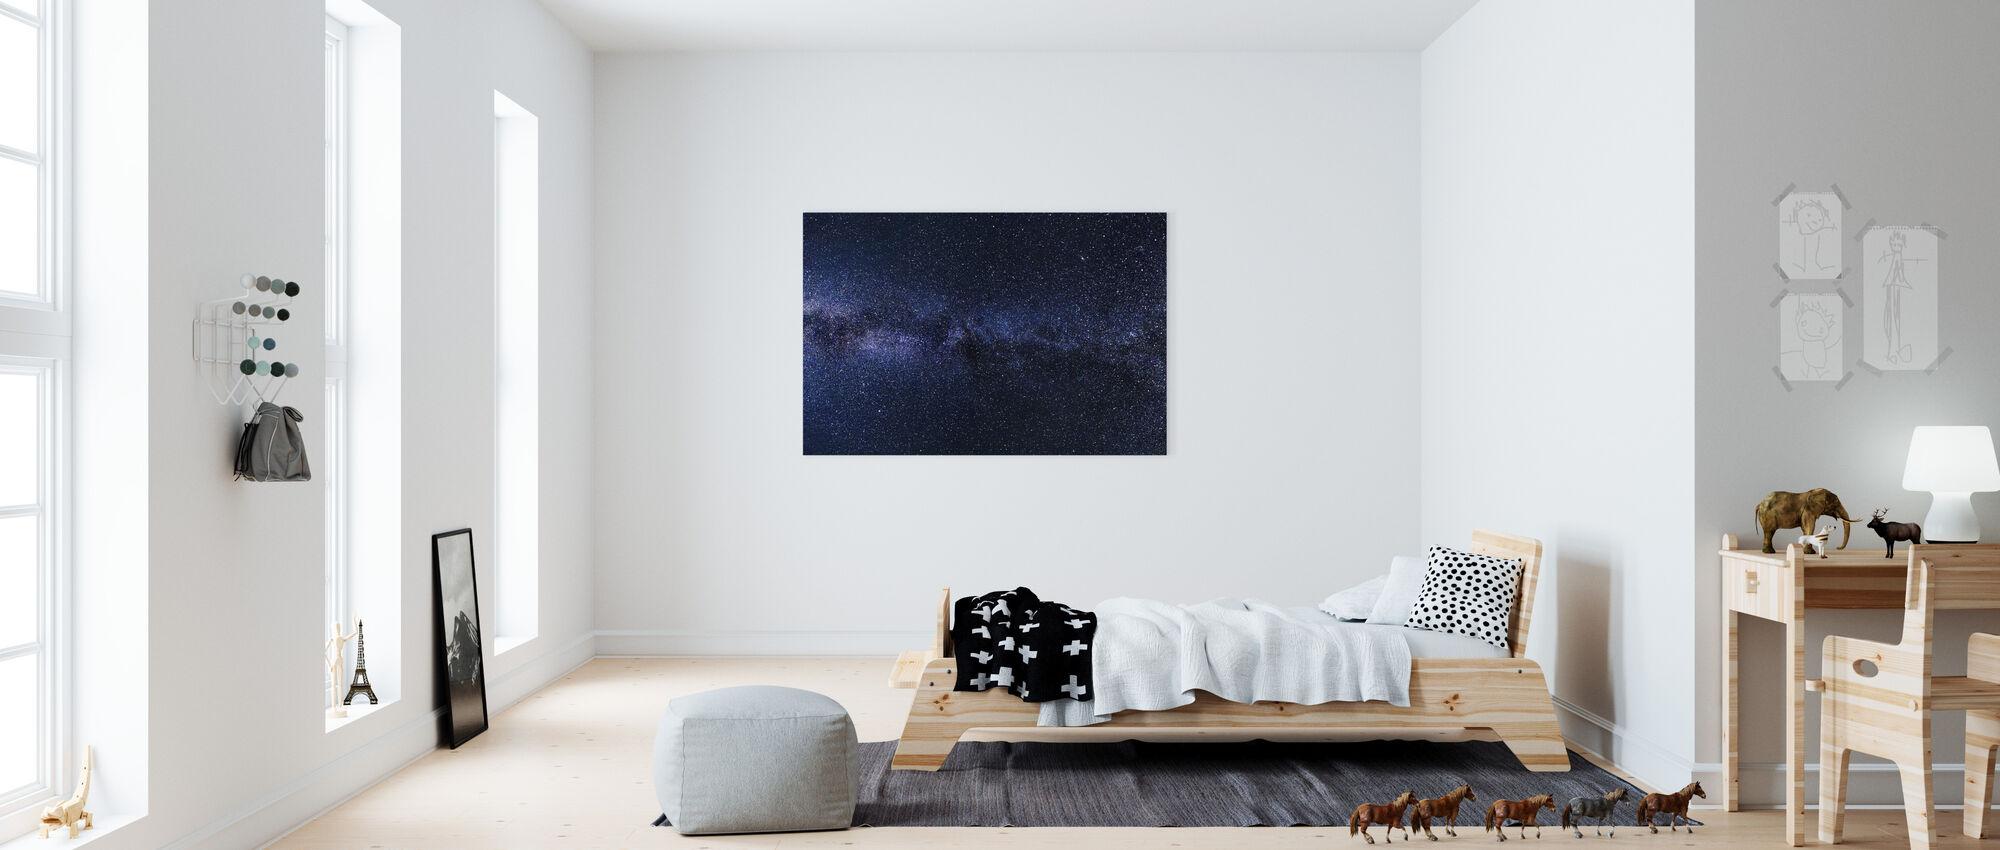 Mystical Starry Sky - Canvas print - Kids Room